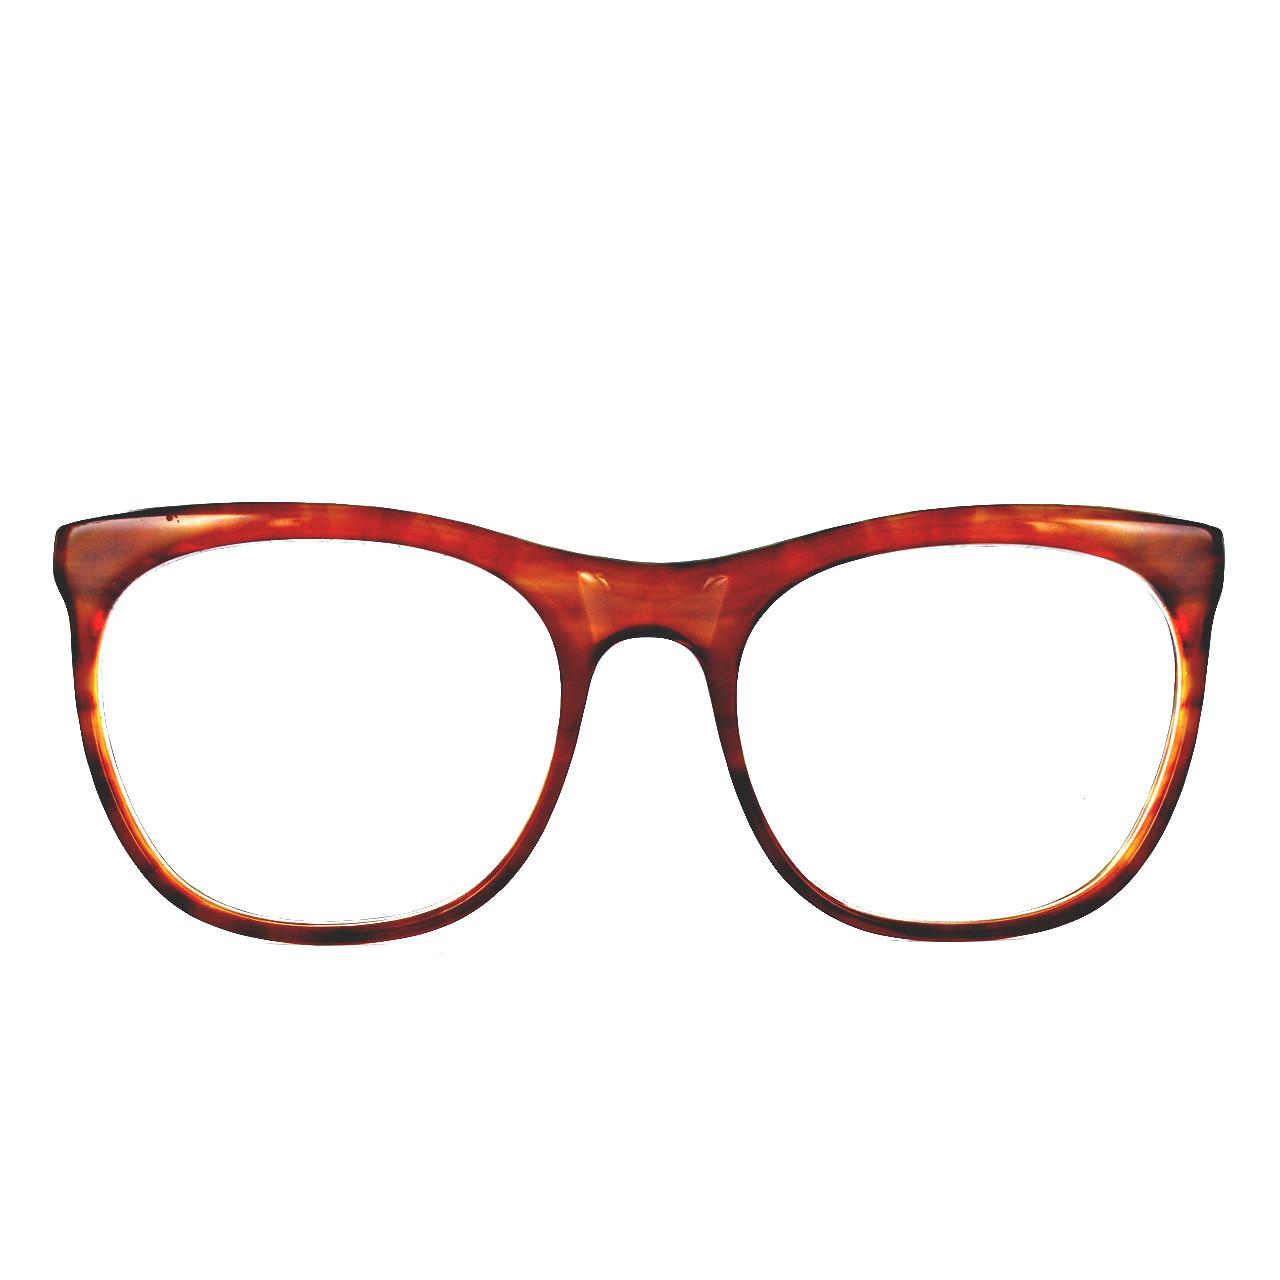 GEEK Eyewear GEEK 708